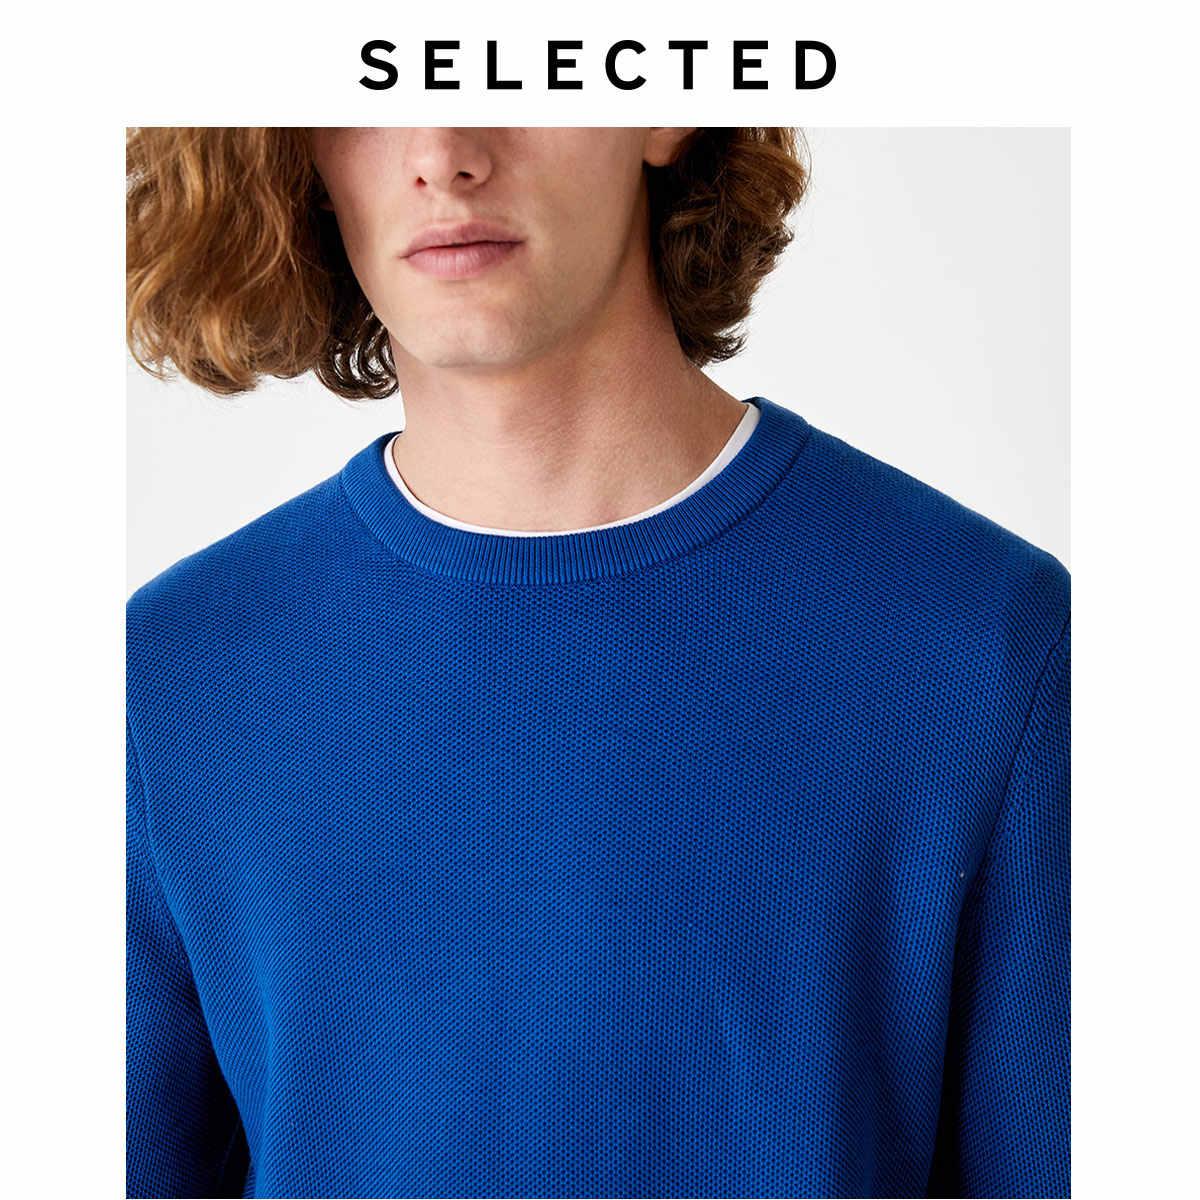 SELECTED 가을 Pullovers 옷-긴팔 남성 라운드 칼라 레저 니트 스웨터 셔츠 S   419324516